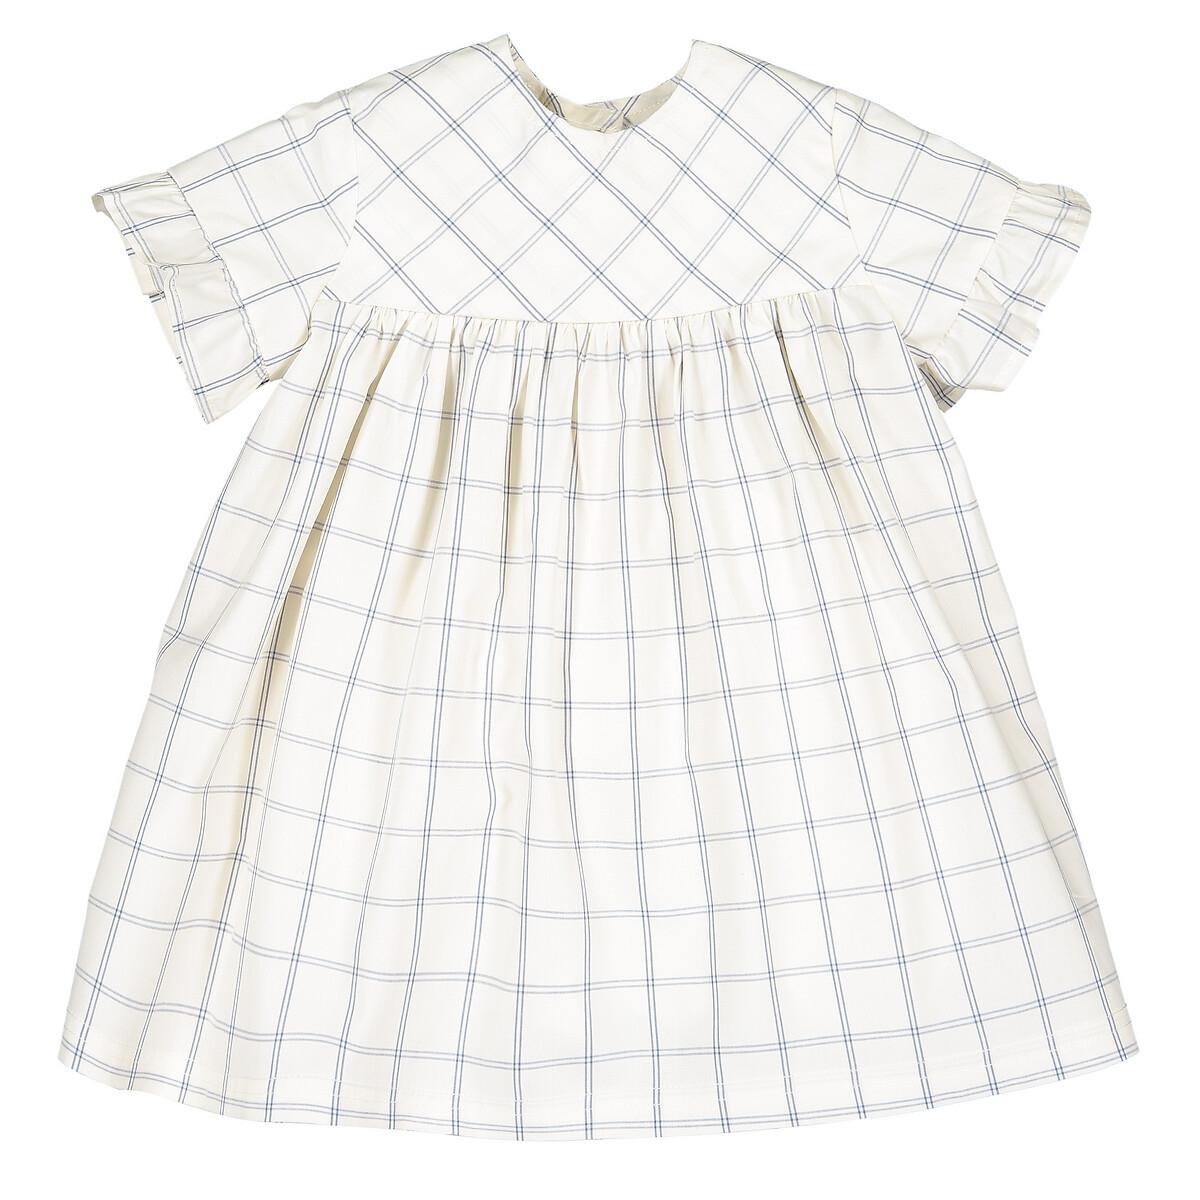 Платье LaRedoute В клетку из шуршащего поплина 3 мес - 4 года 1 год 74 см другие